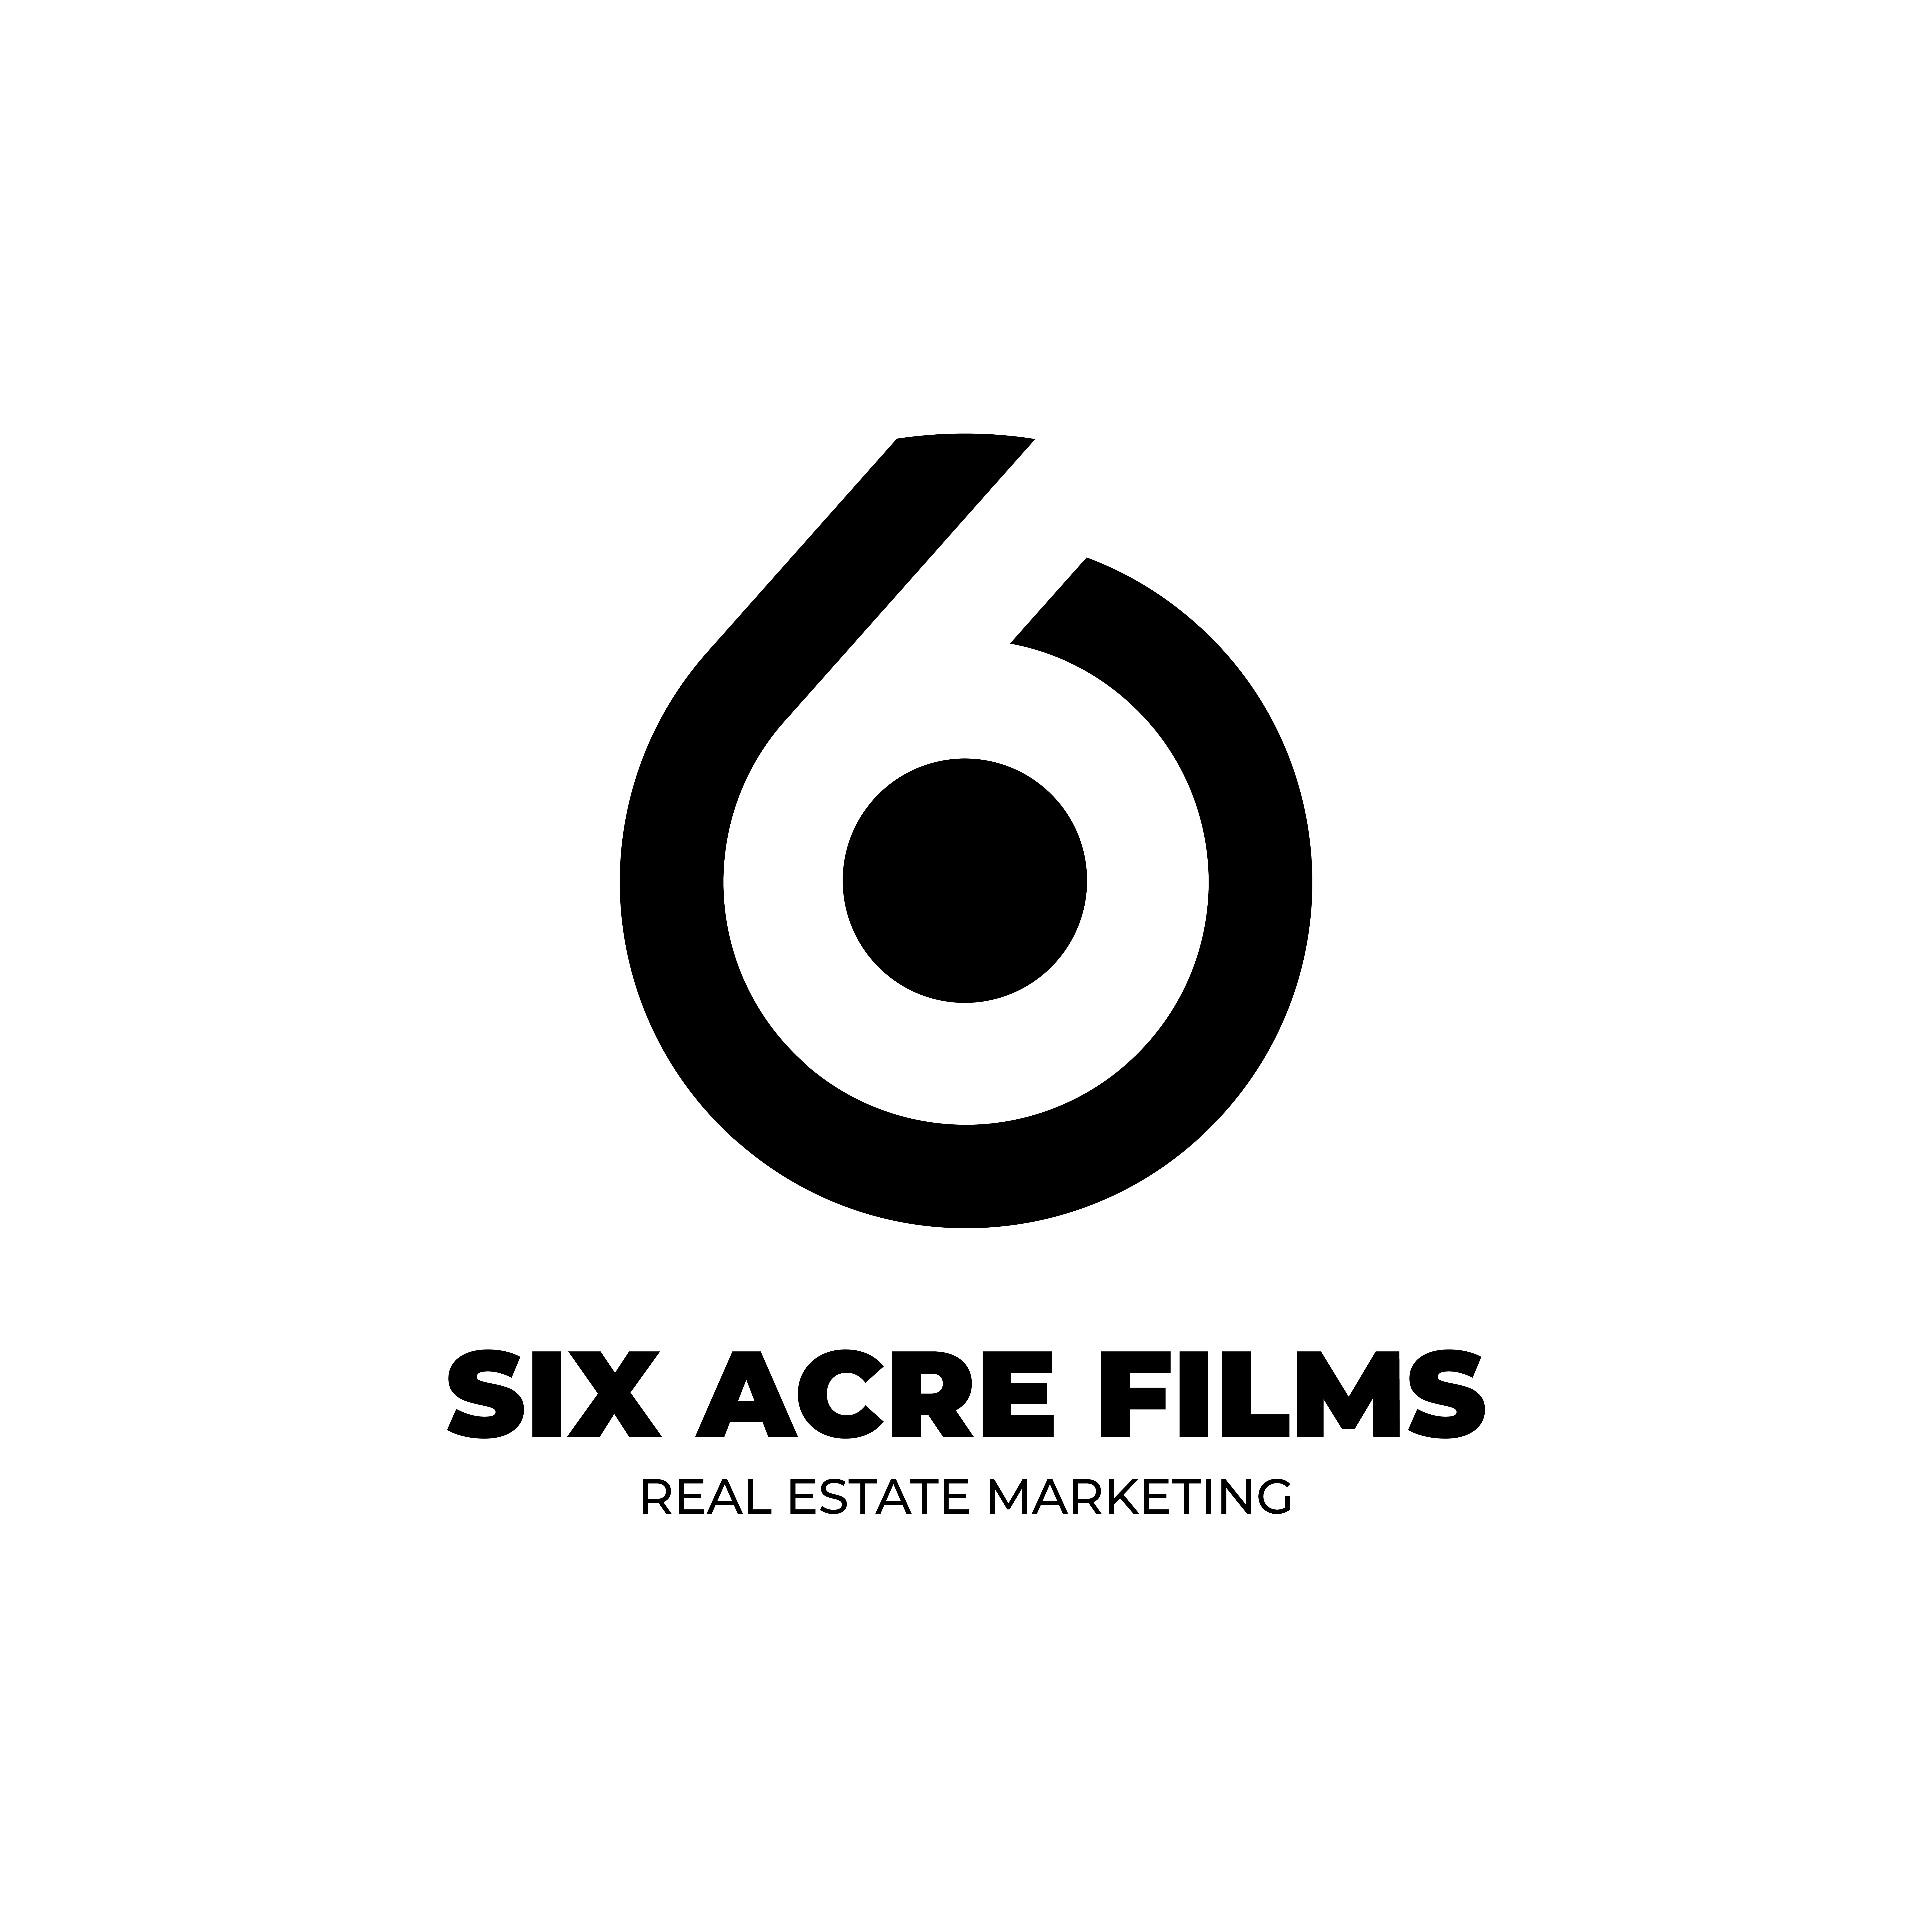 Six Acre Films floor plan in Costa Mesa Los Angeles Santa Barbara Thousand Oaks